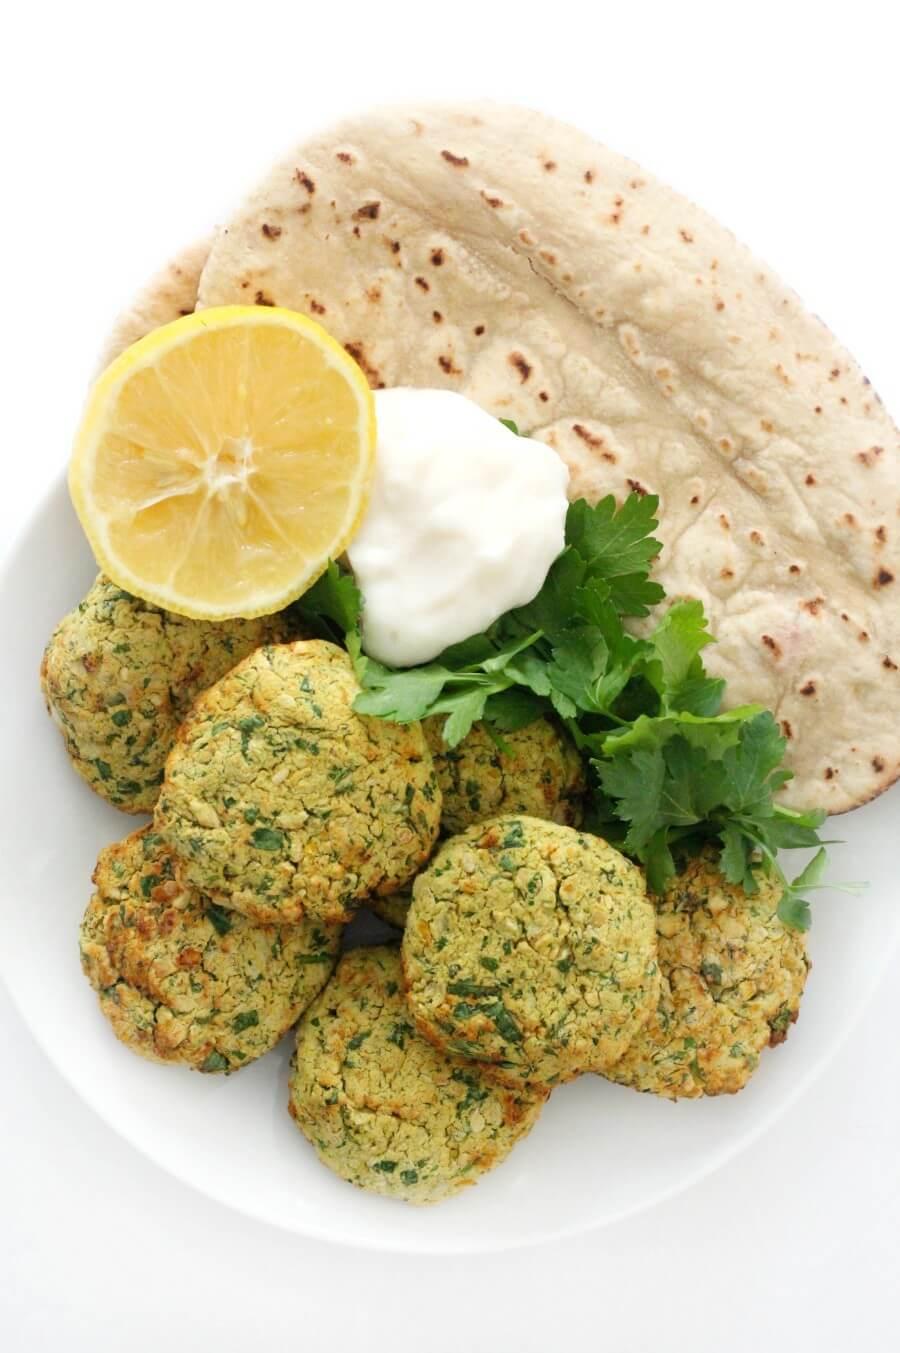 Healthy Air Fryer Falafel Recipe (Vegan, Gluten-Free, Oil-Free)